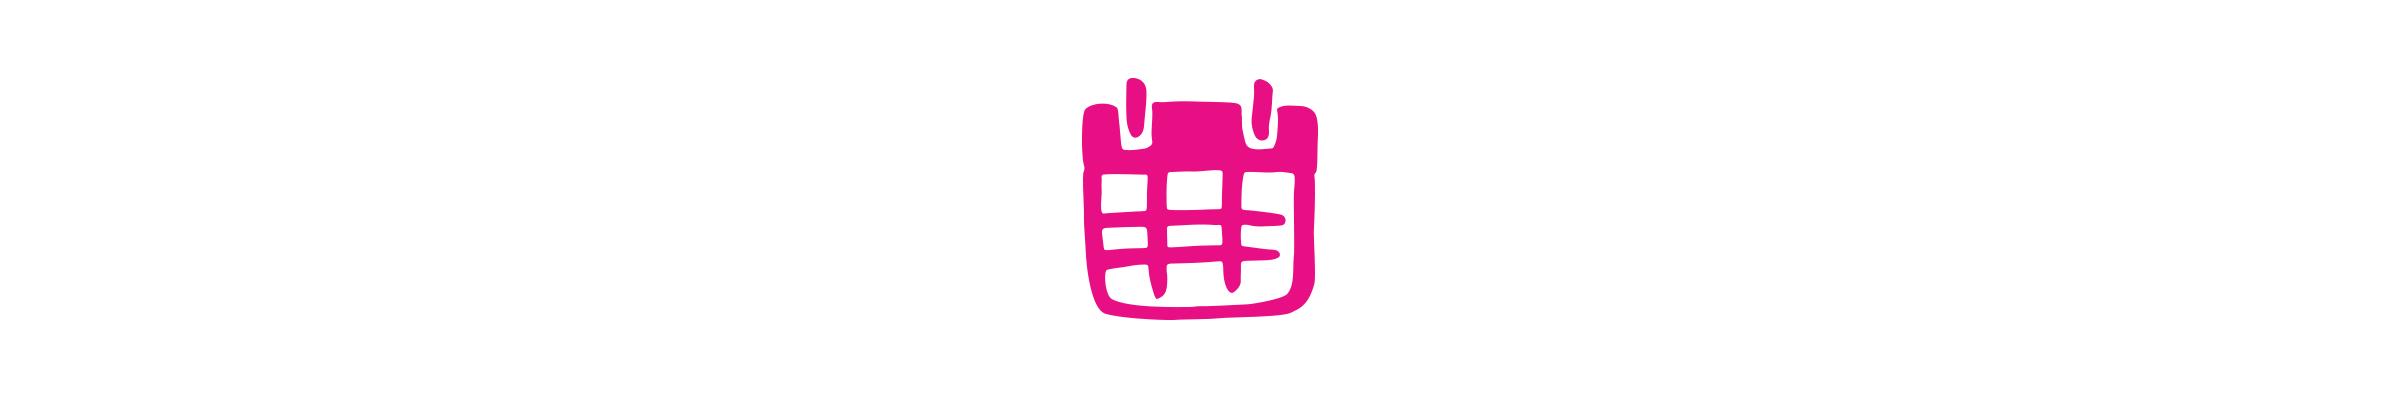 miki-icon-calendar-v2.png